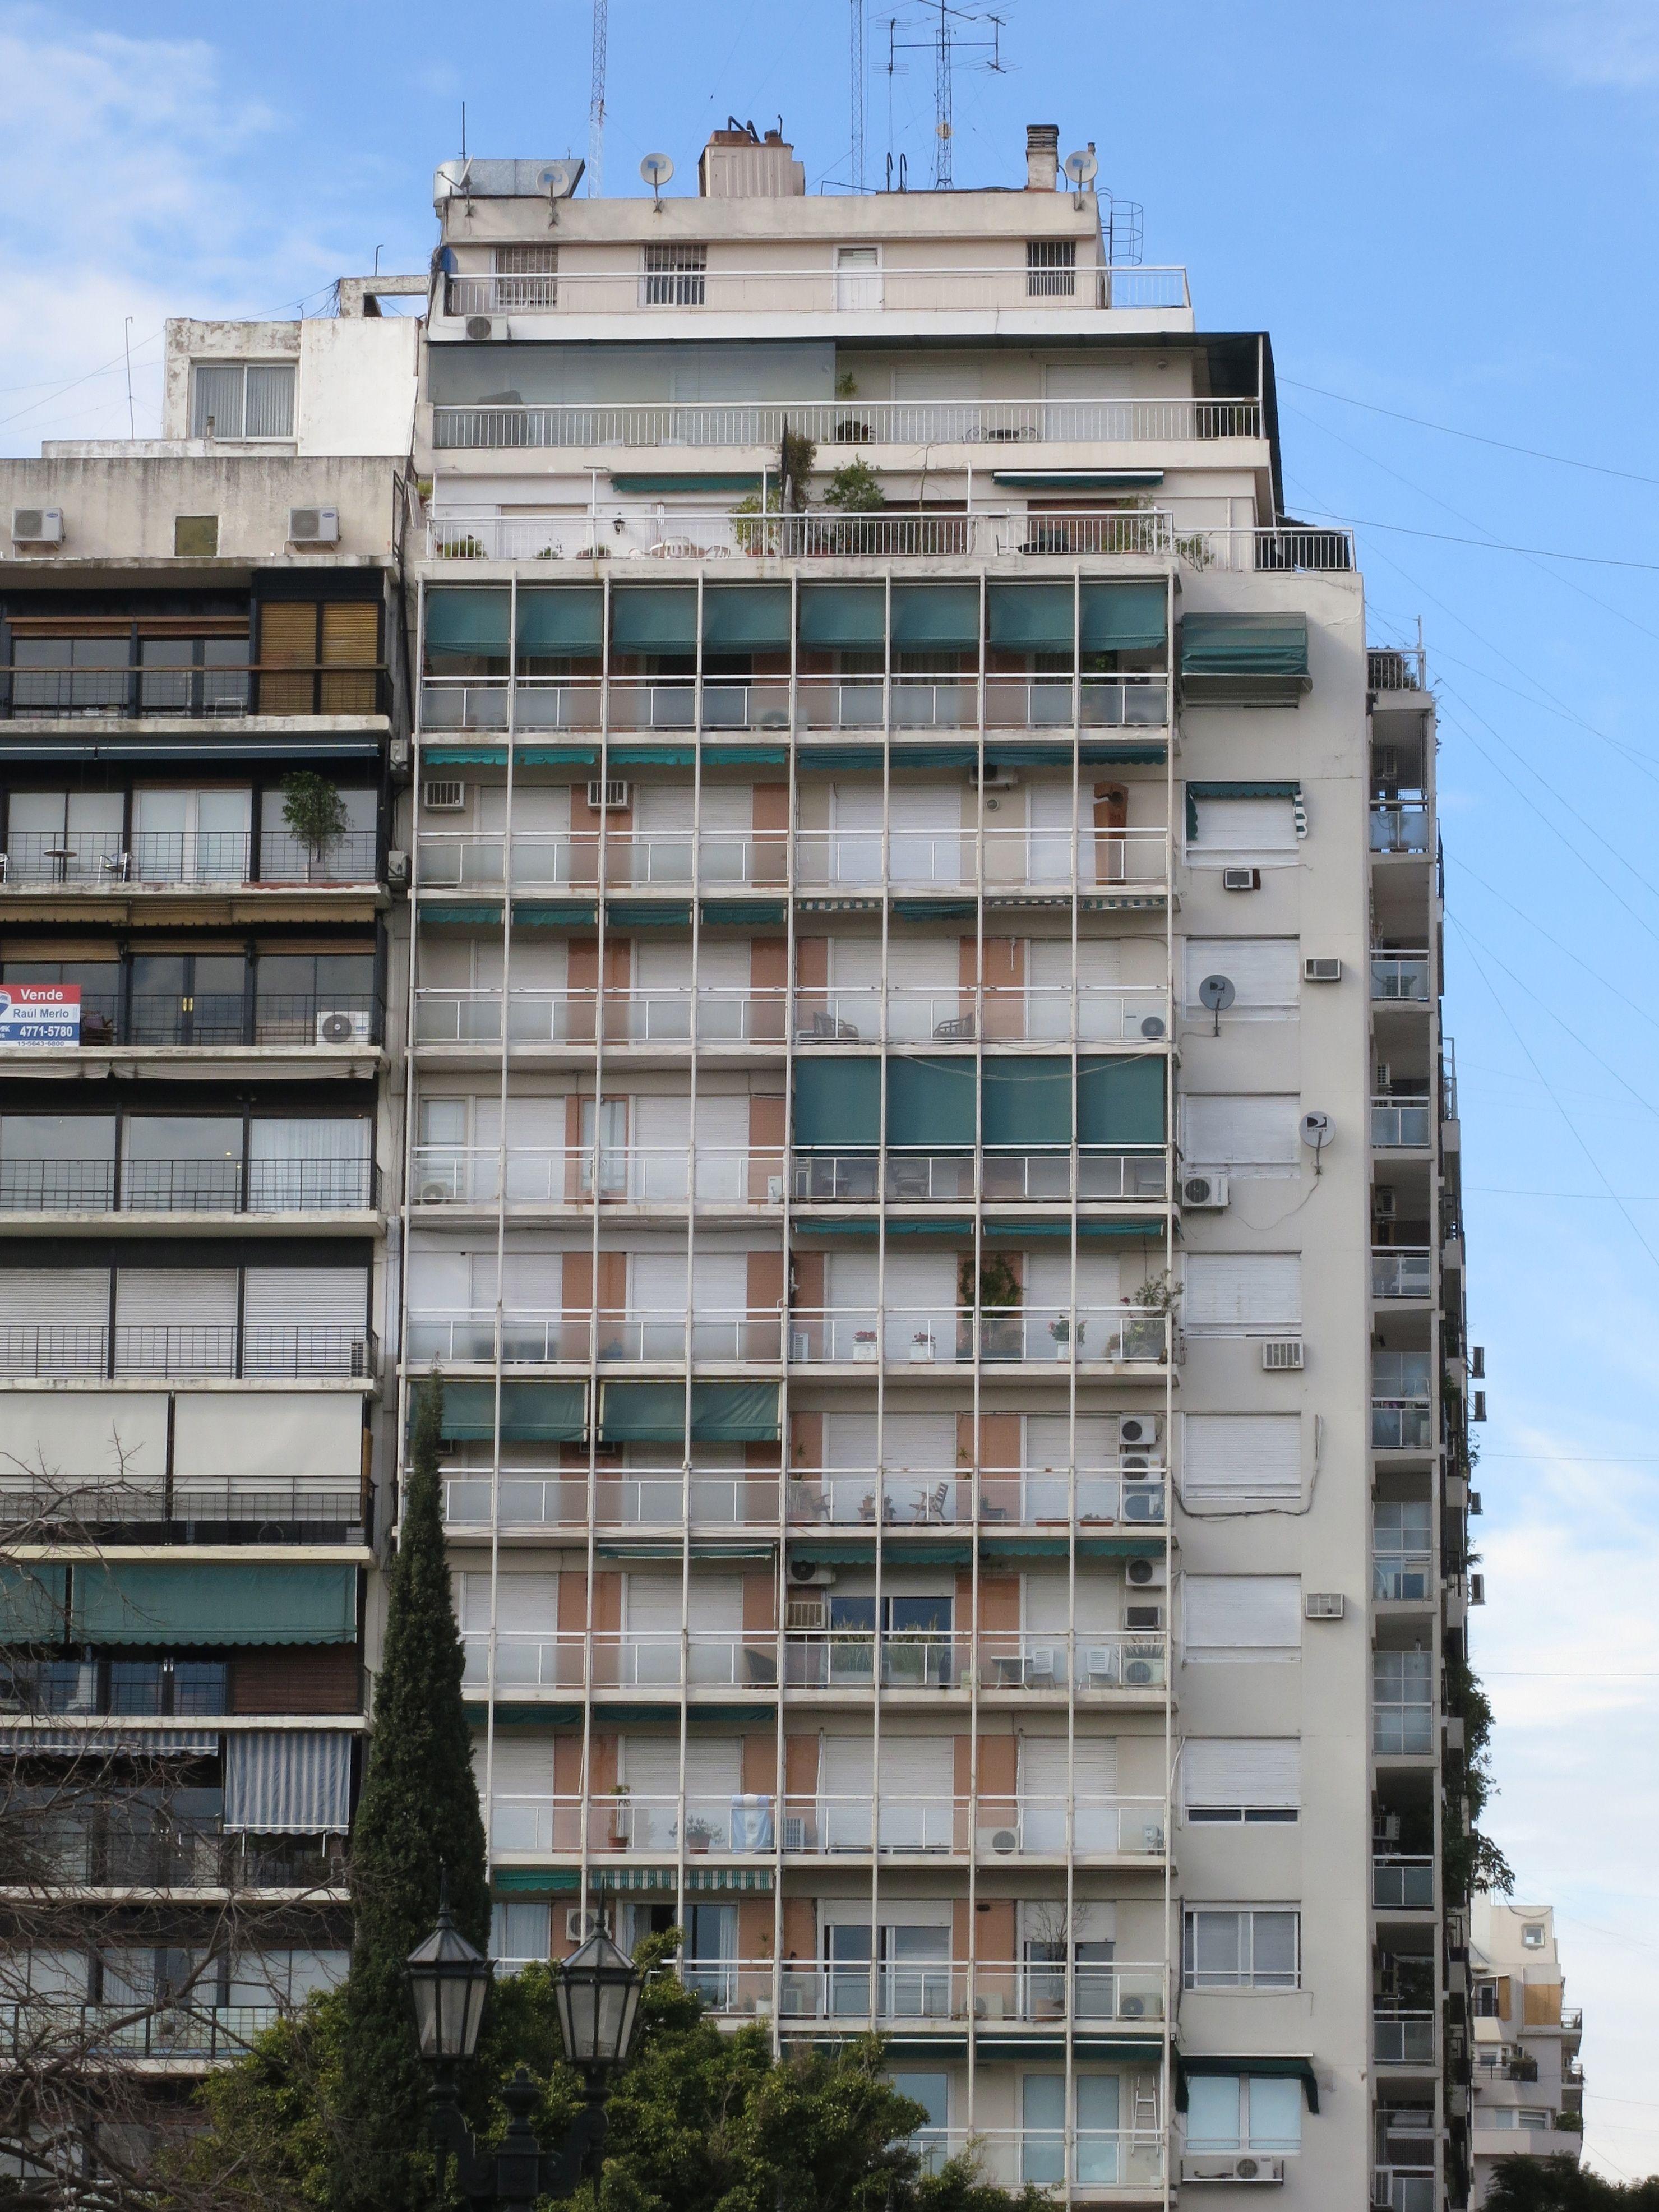 #Architecture #BuenosAires #Argentina #Travel